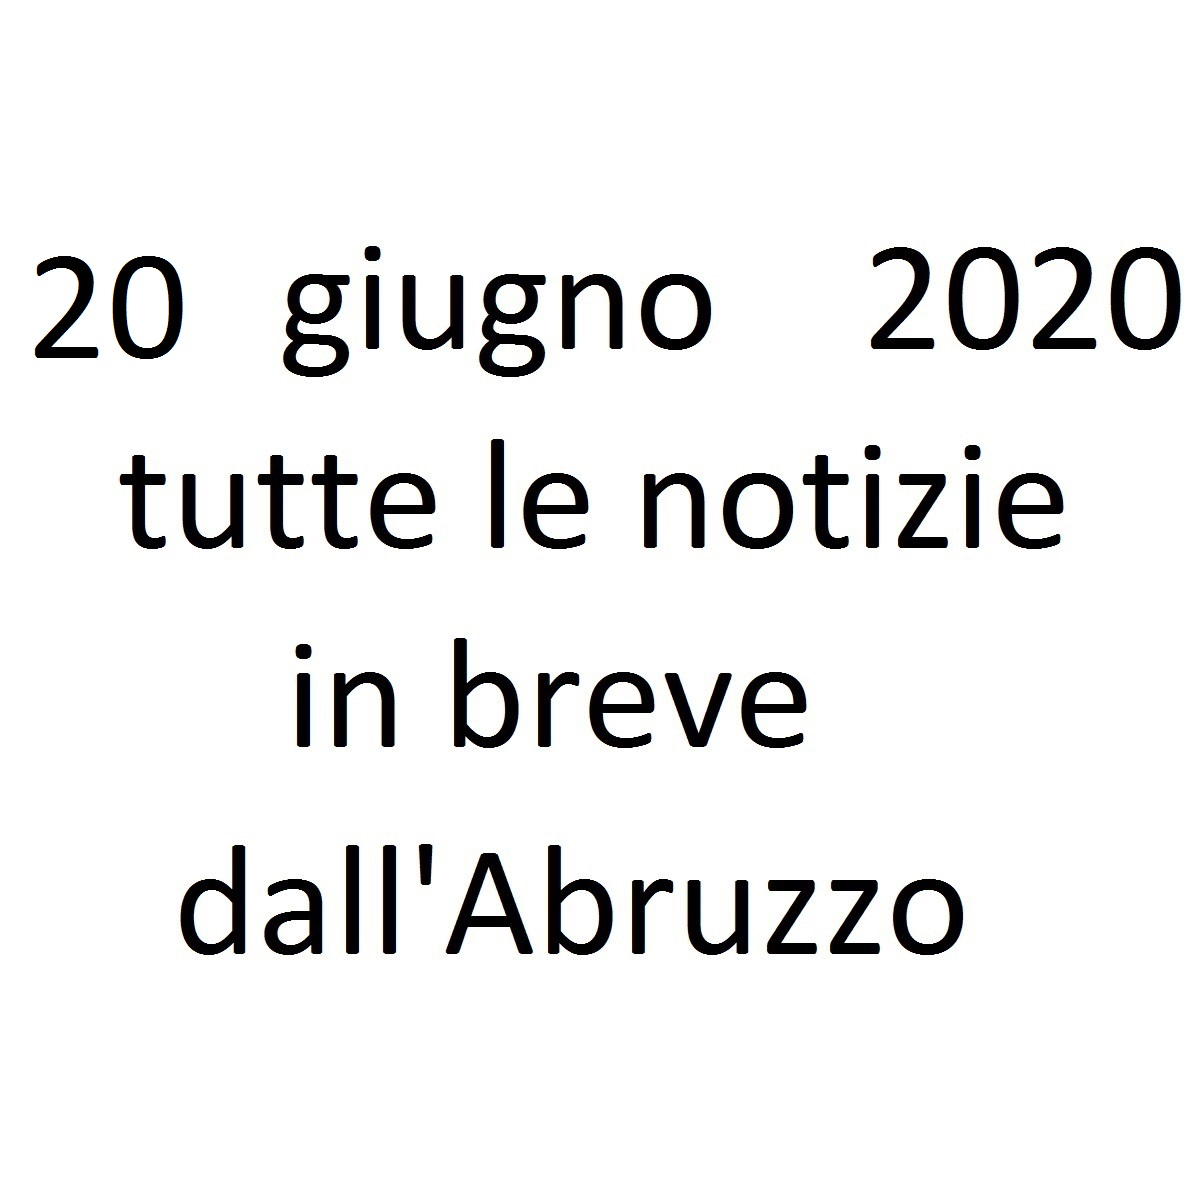 20 giugno 2020 notizie in breve foto